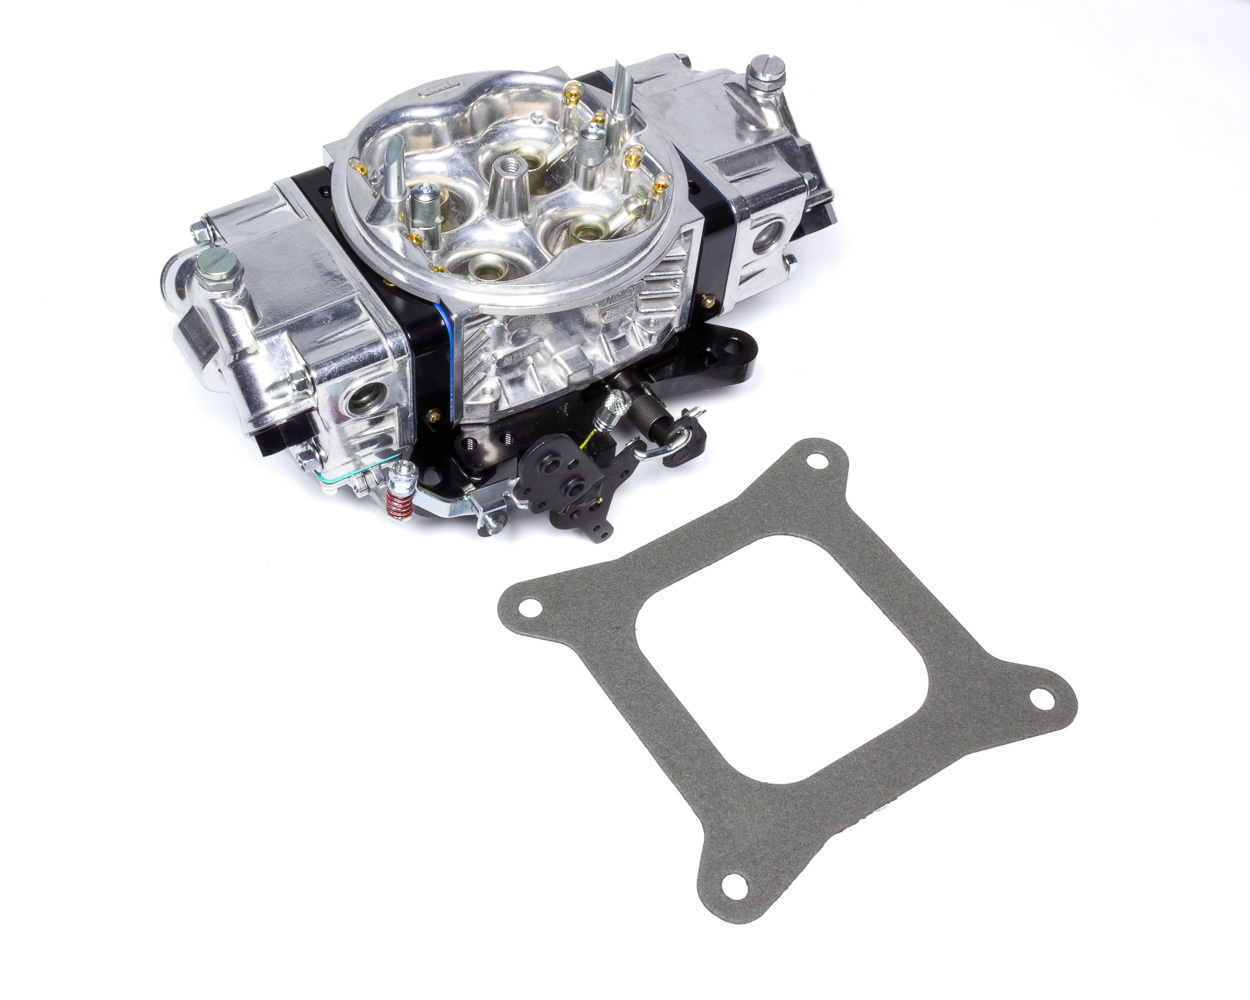 Holley 0-67199BK Carburetor, Track Warrior, 4-Barrel, 650 CFM, Square Bore, No Choke, Mechanical Secondary, Dual Inlet, Black / Silver, Each